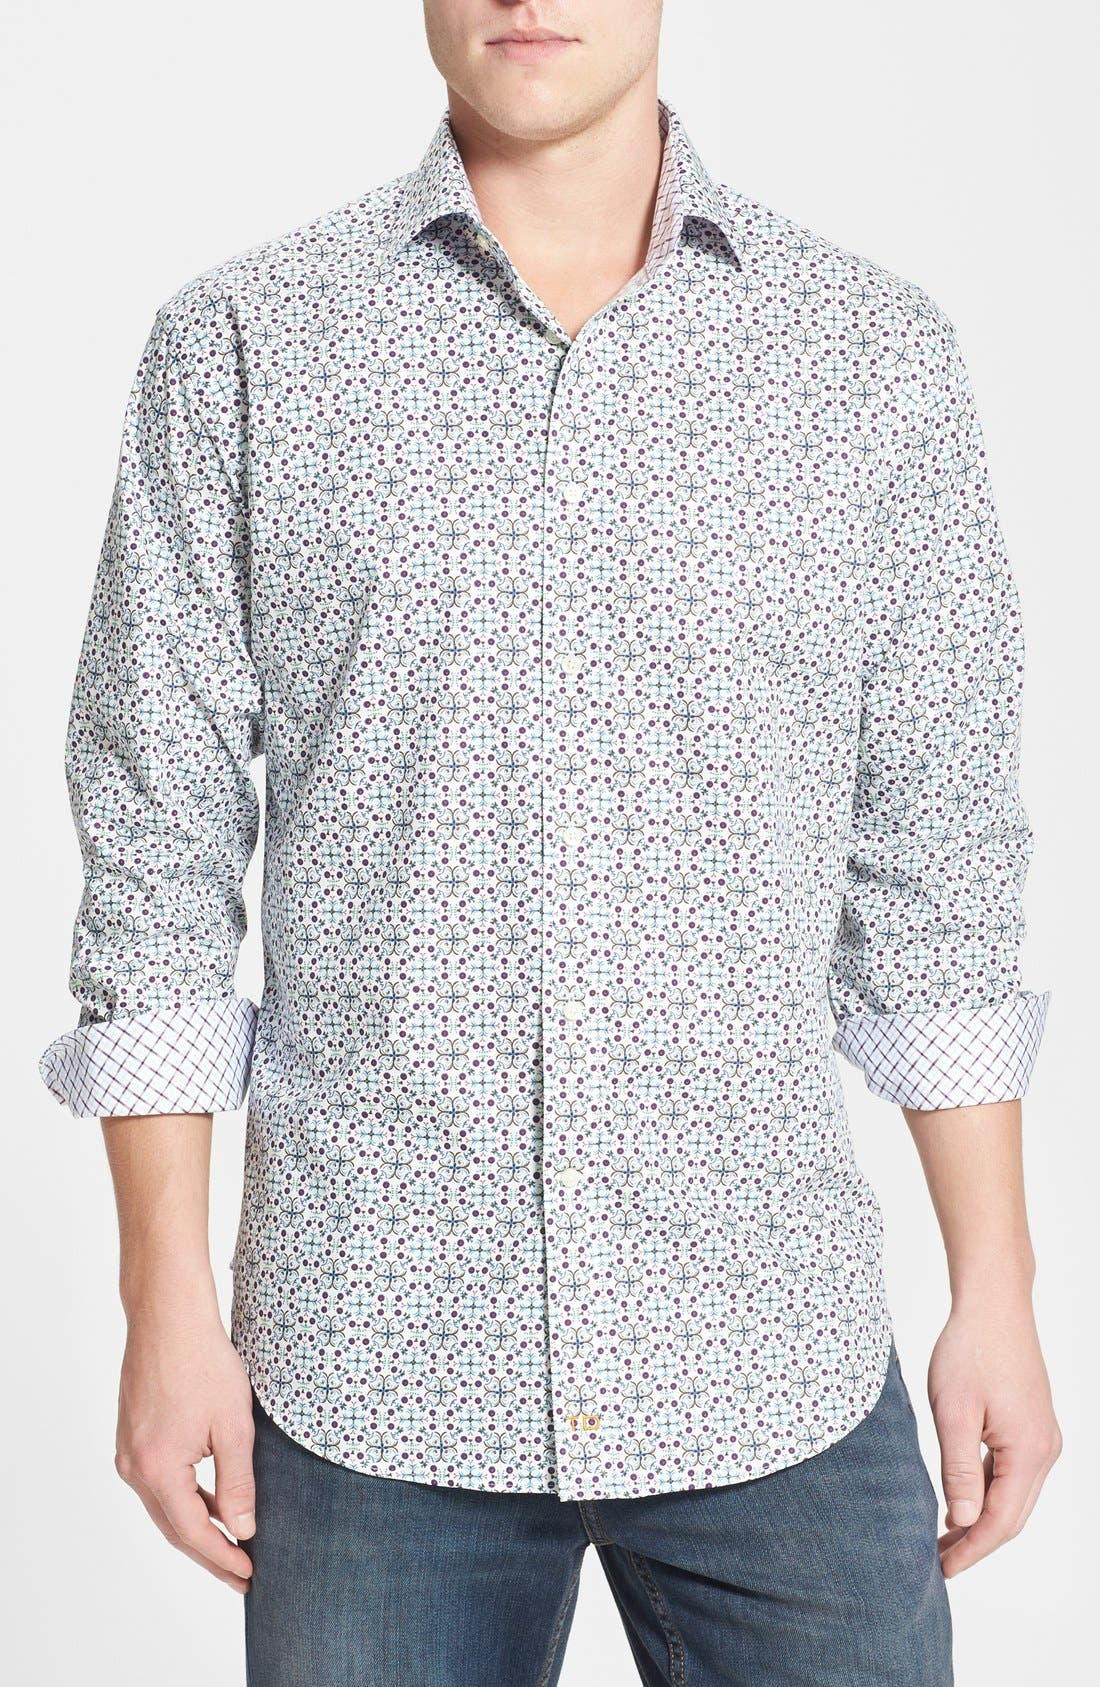 Alternate Image 1 Selected - Thomas Dean Regular Fit Print Sport Shirt